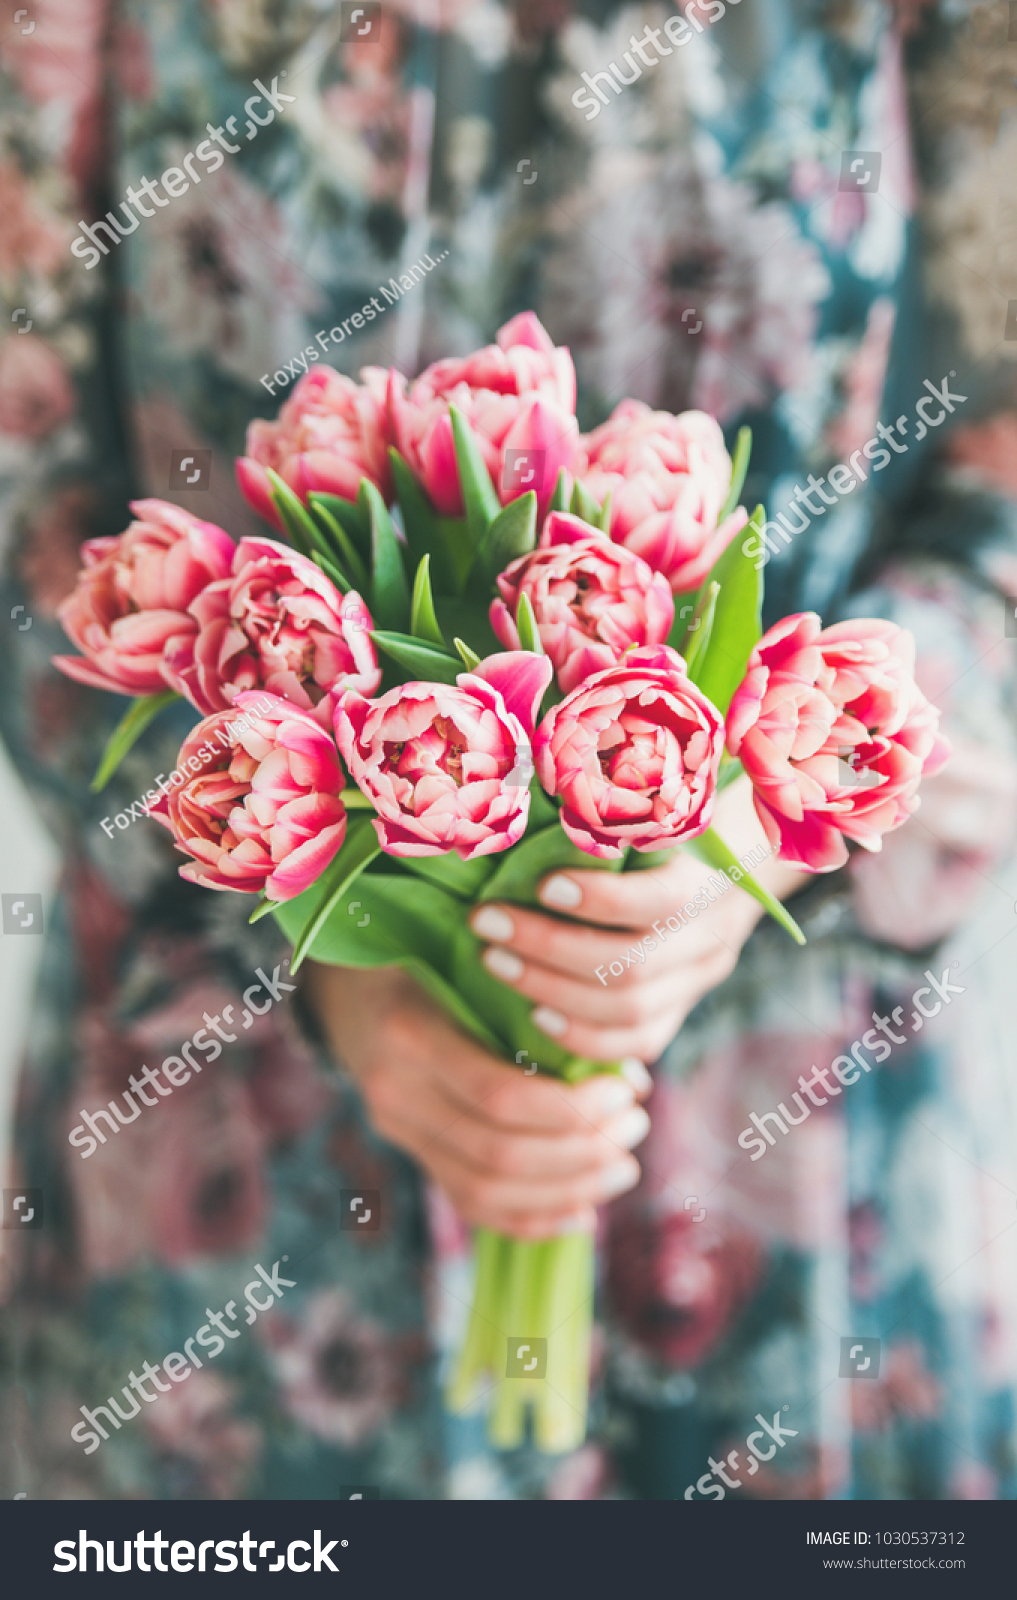 Spring flowers arrangement woman colorful silk stock photo 100 spring flowers arrangement woman in colorful silk dress holding bouquet of fresh pink tulips mightylinksfo